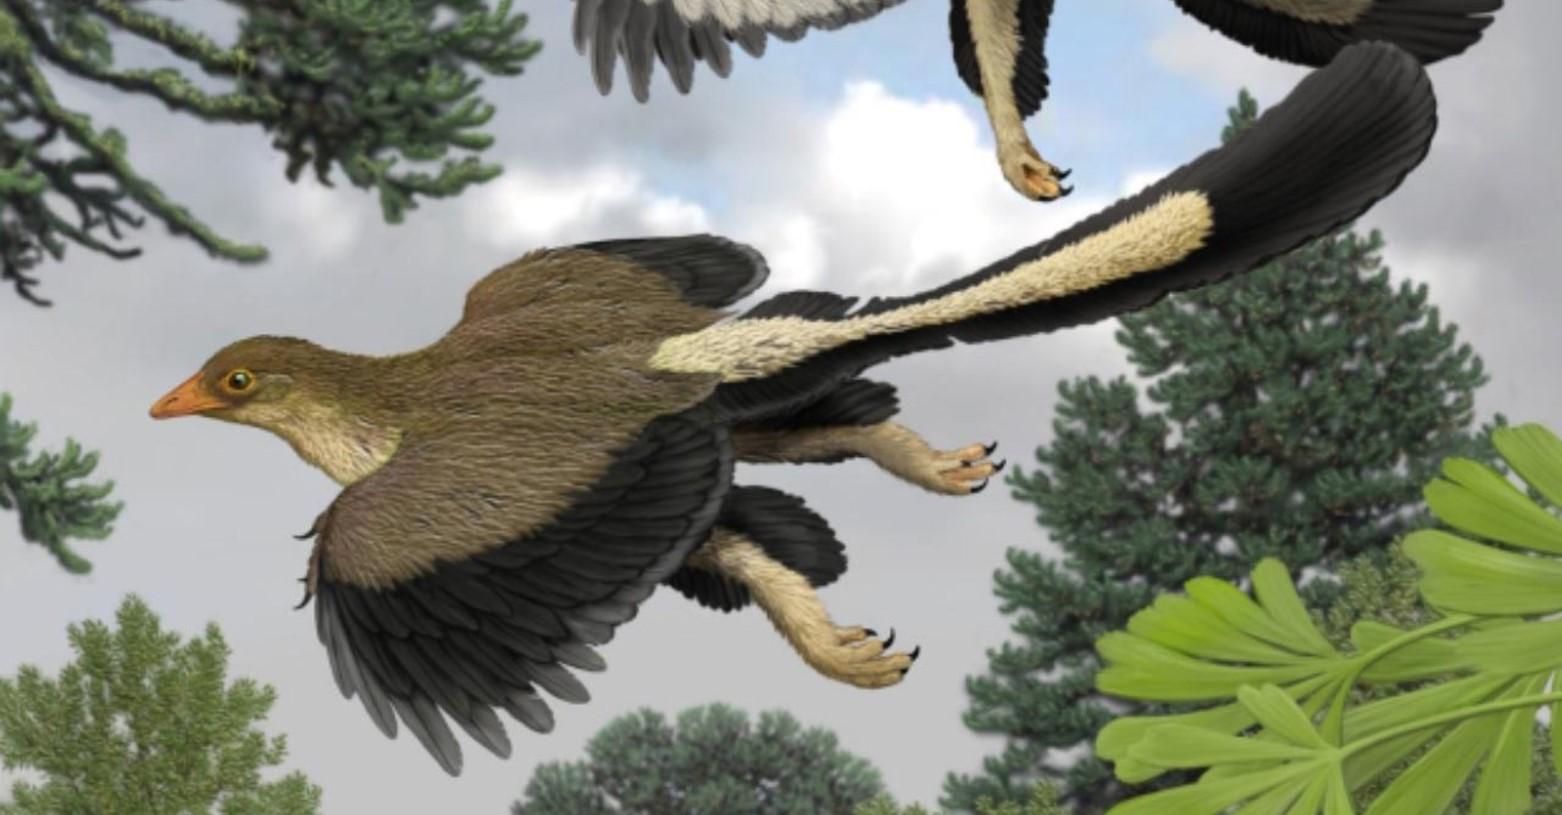 repulo_archaeopteryx_fb.jpg